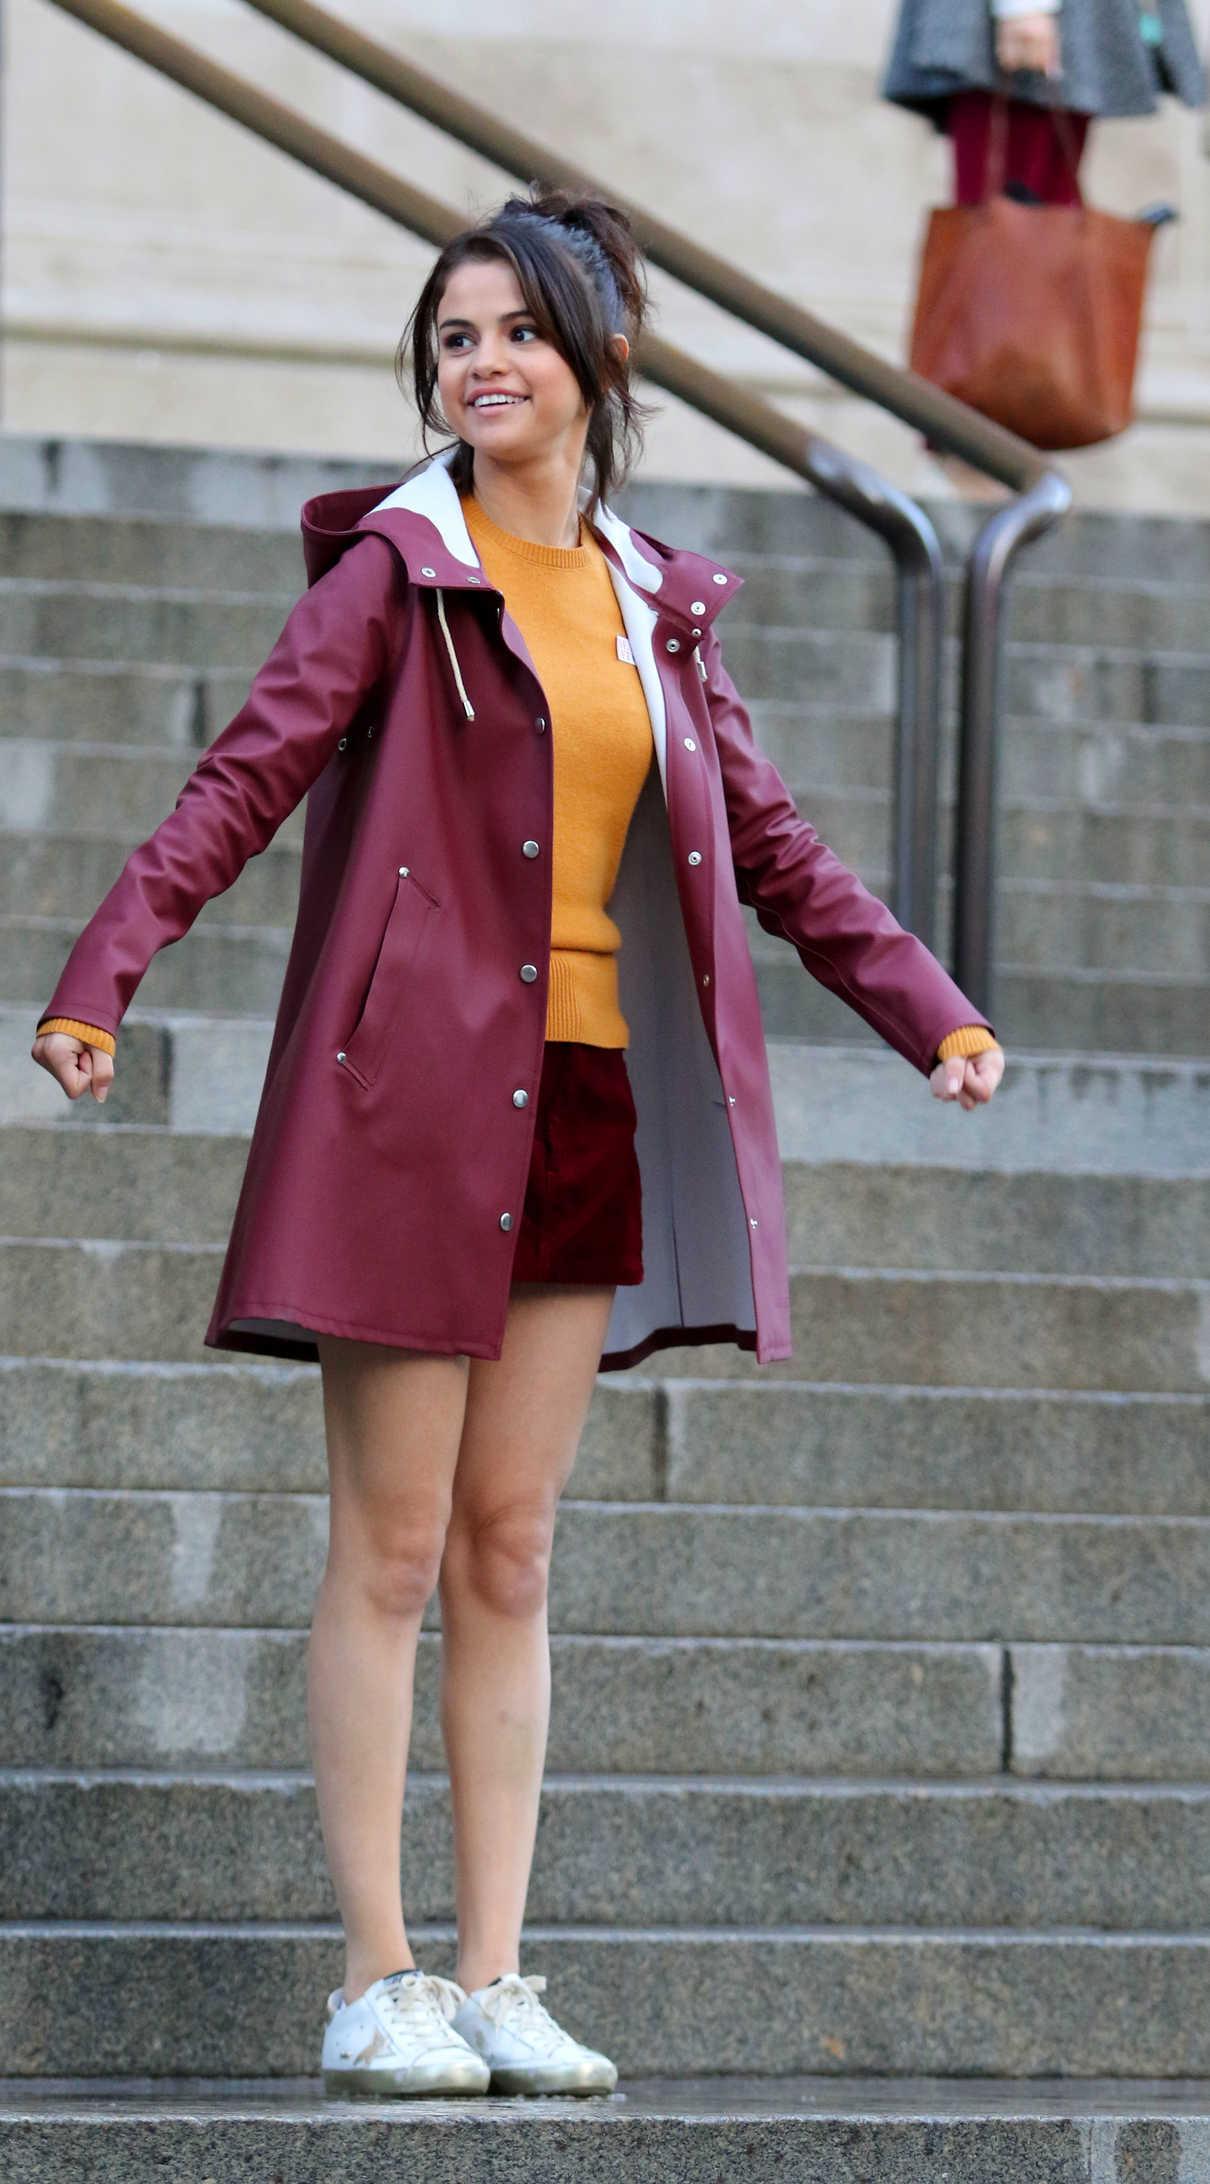 Selena Gomez on the Set of New Woody Allen Film in NYC 10/04/2017-4